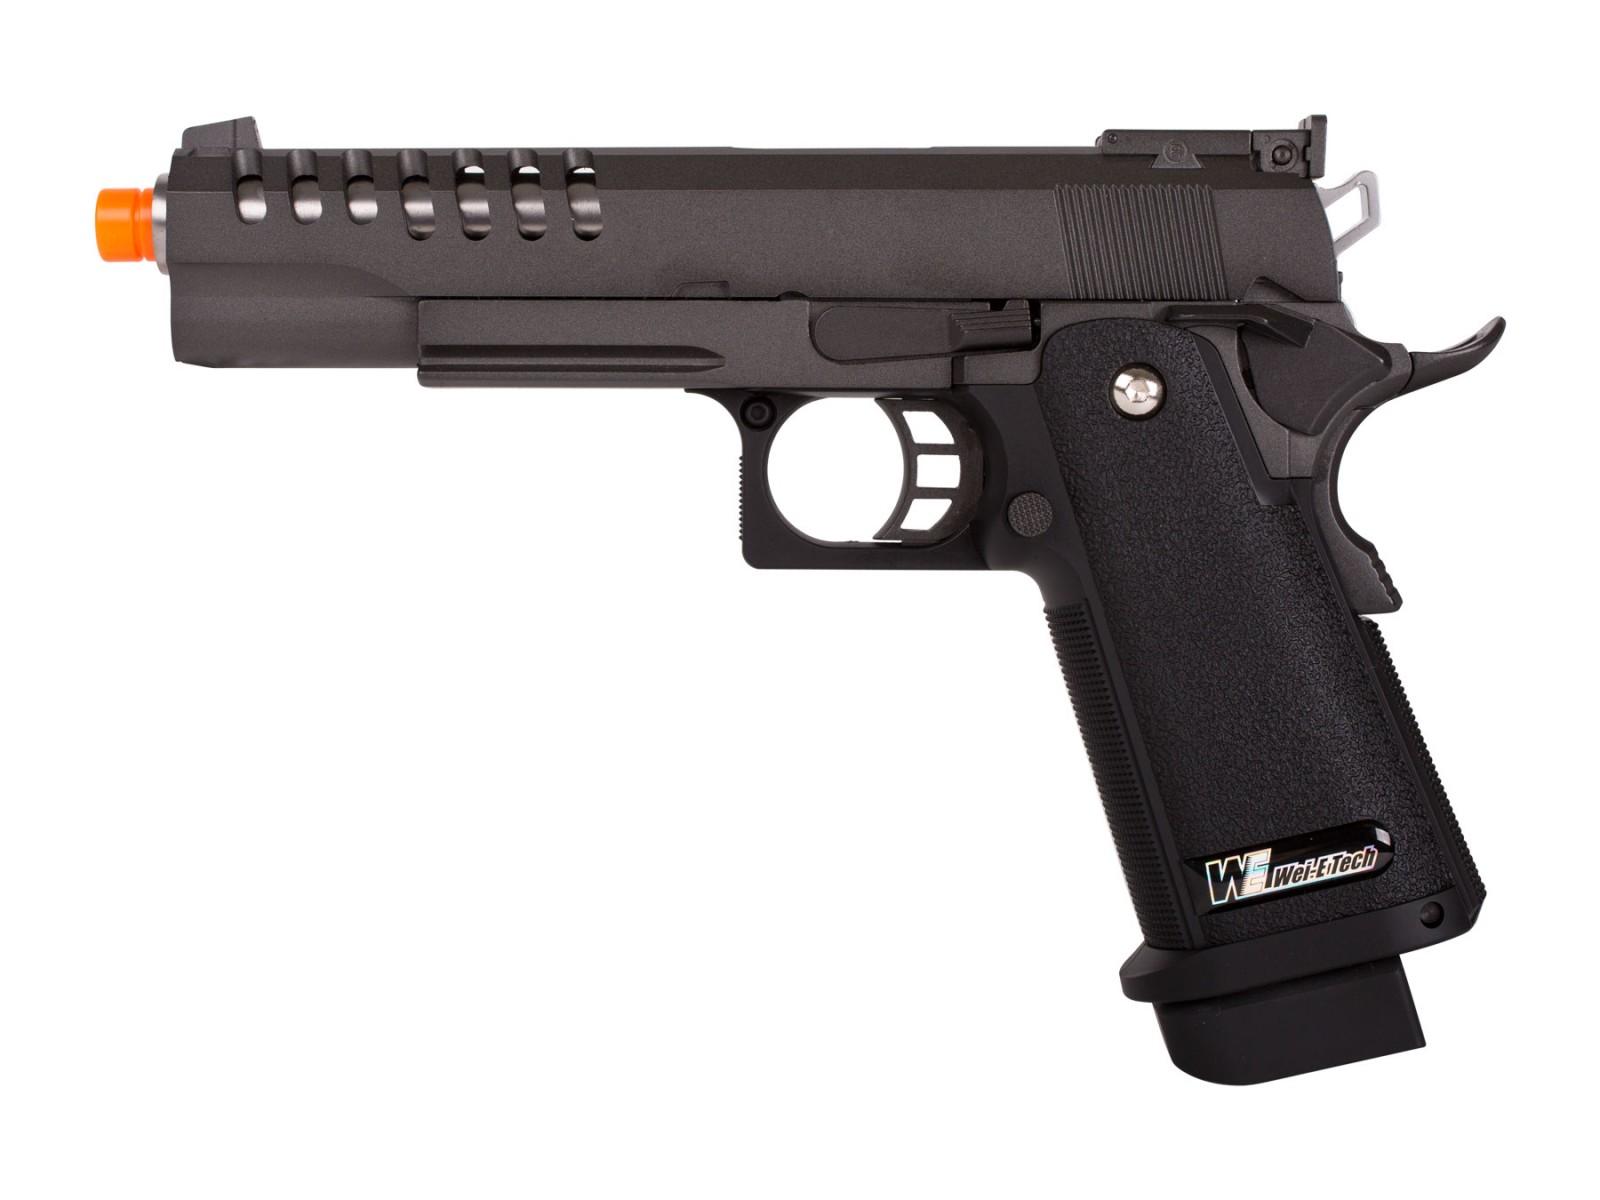 WE Hi-Capa 5.1 K1 Gas Blowback Airsoft Pistol 6mm Image